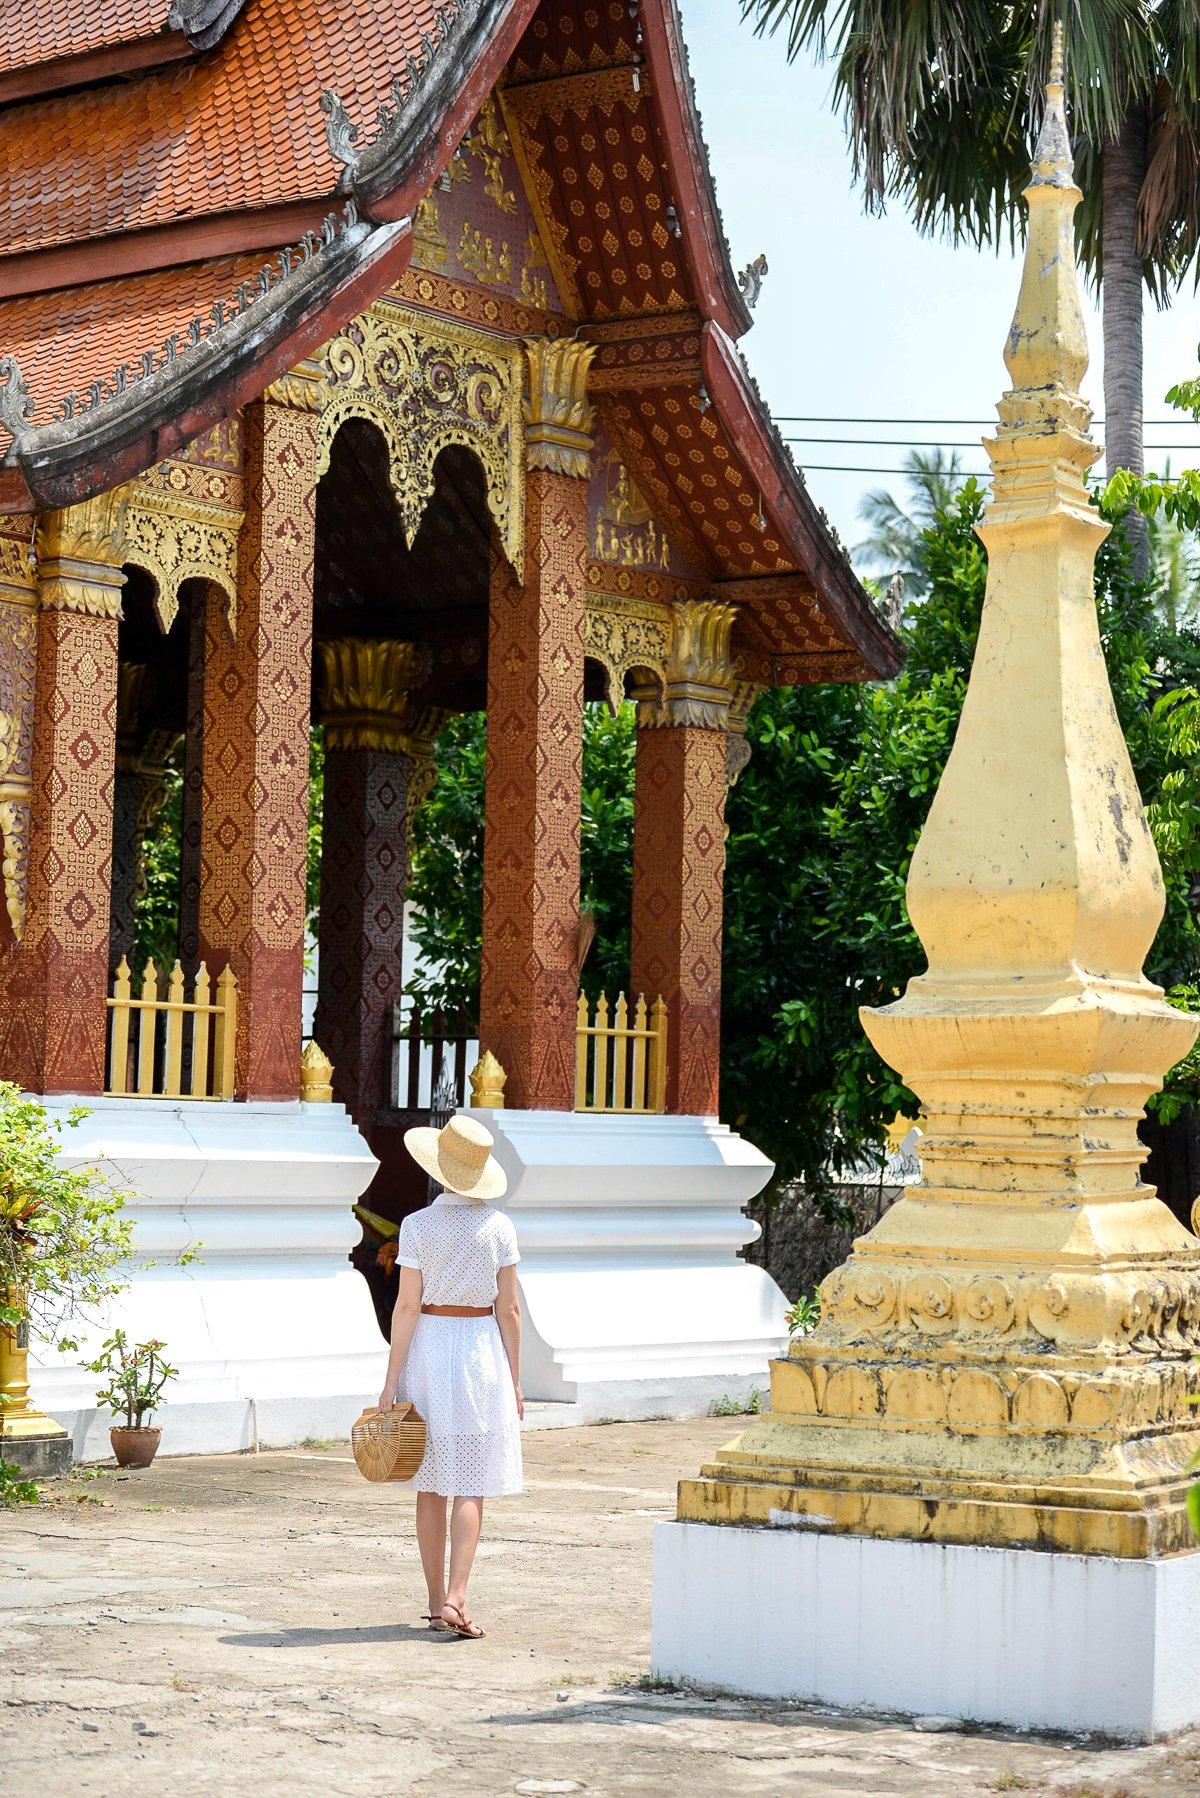 Stacie Flinner 3 Nagas Complete Guide to Luang Prabang-162.jpg